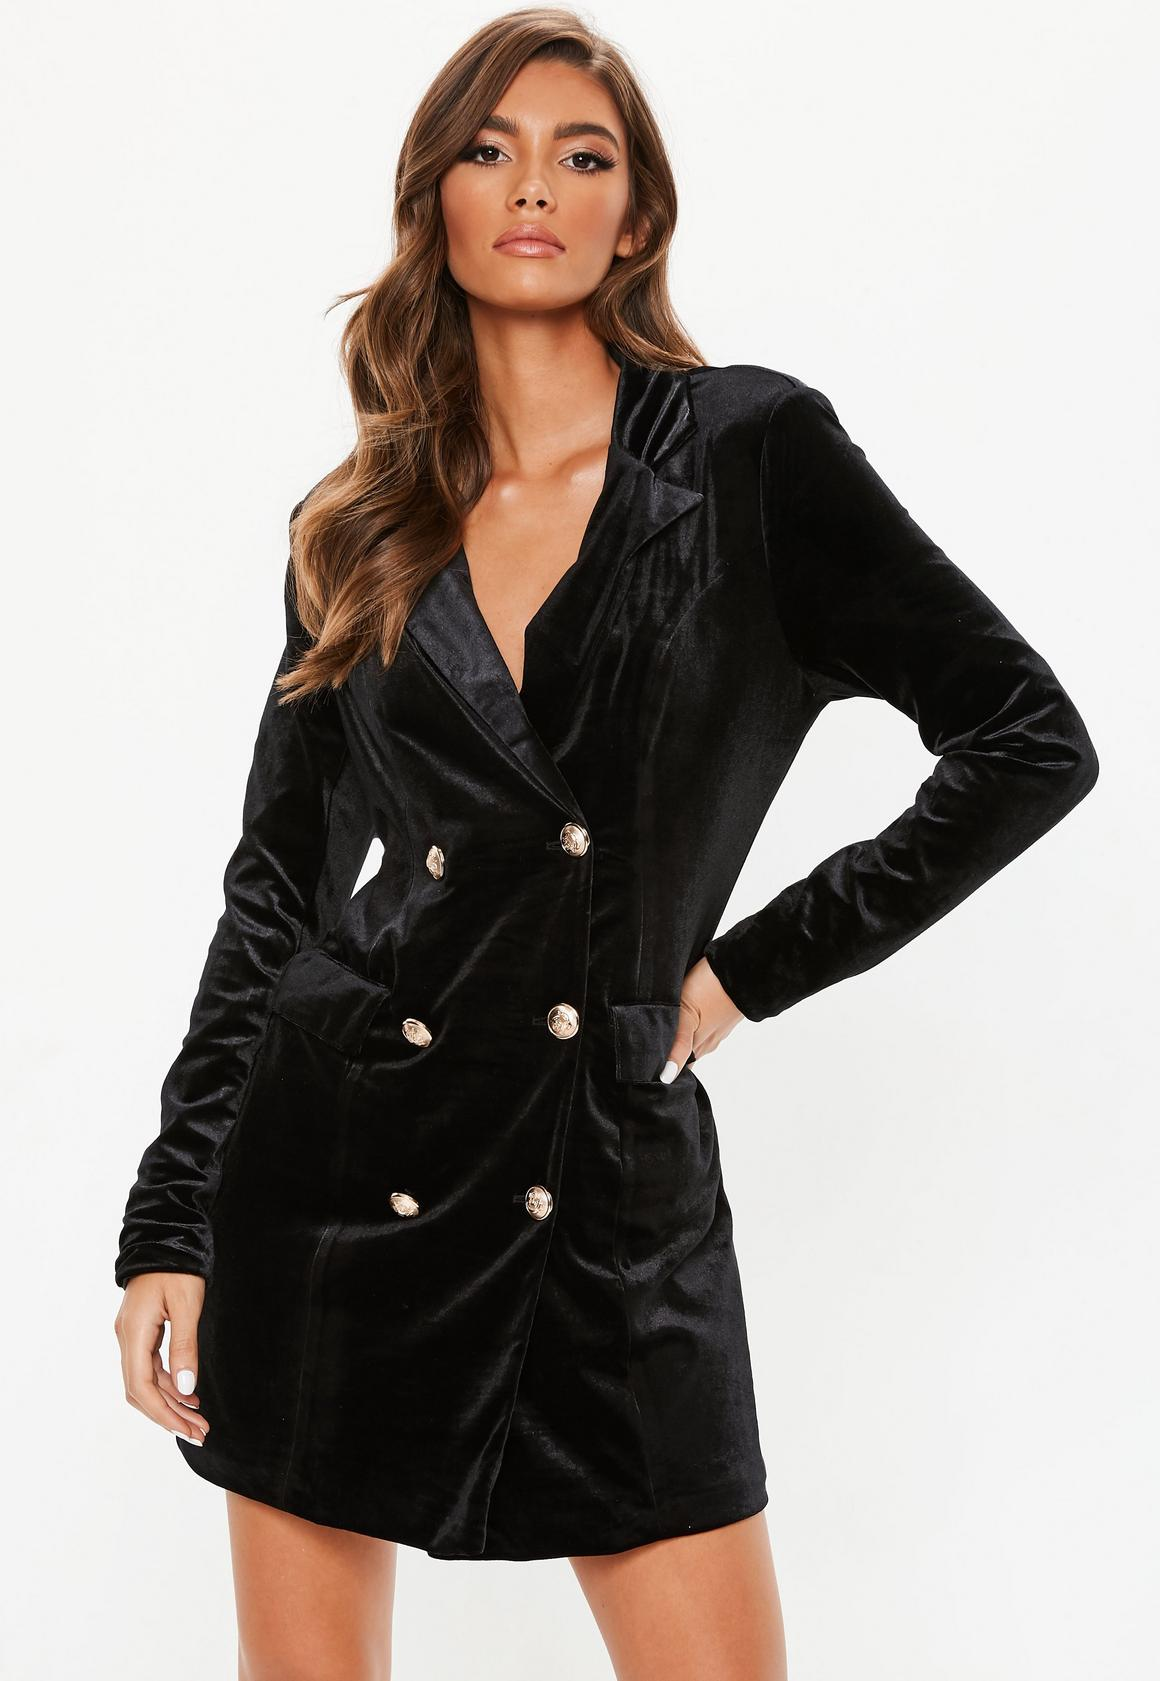 Missguided - robe-blazer en velours e à boutons dorés tall - 1